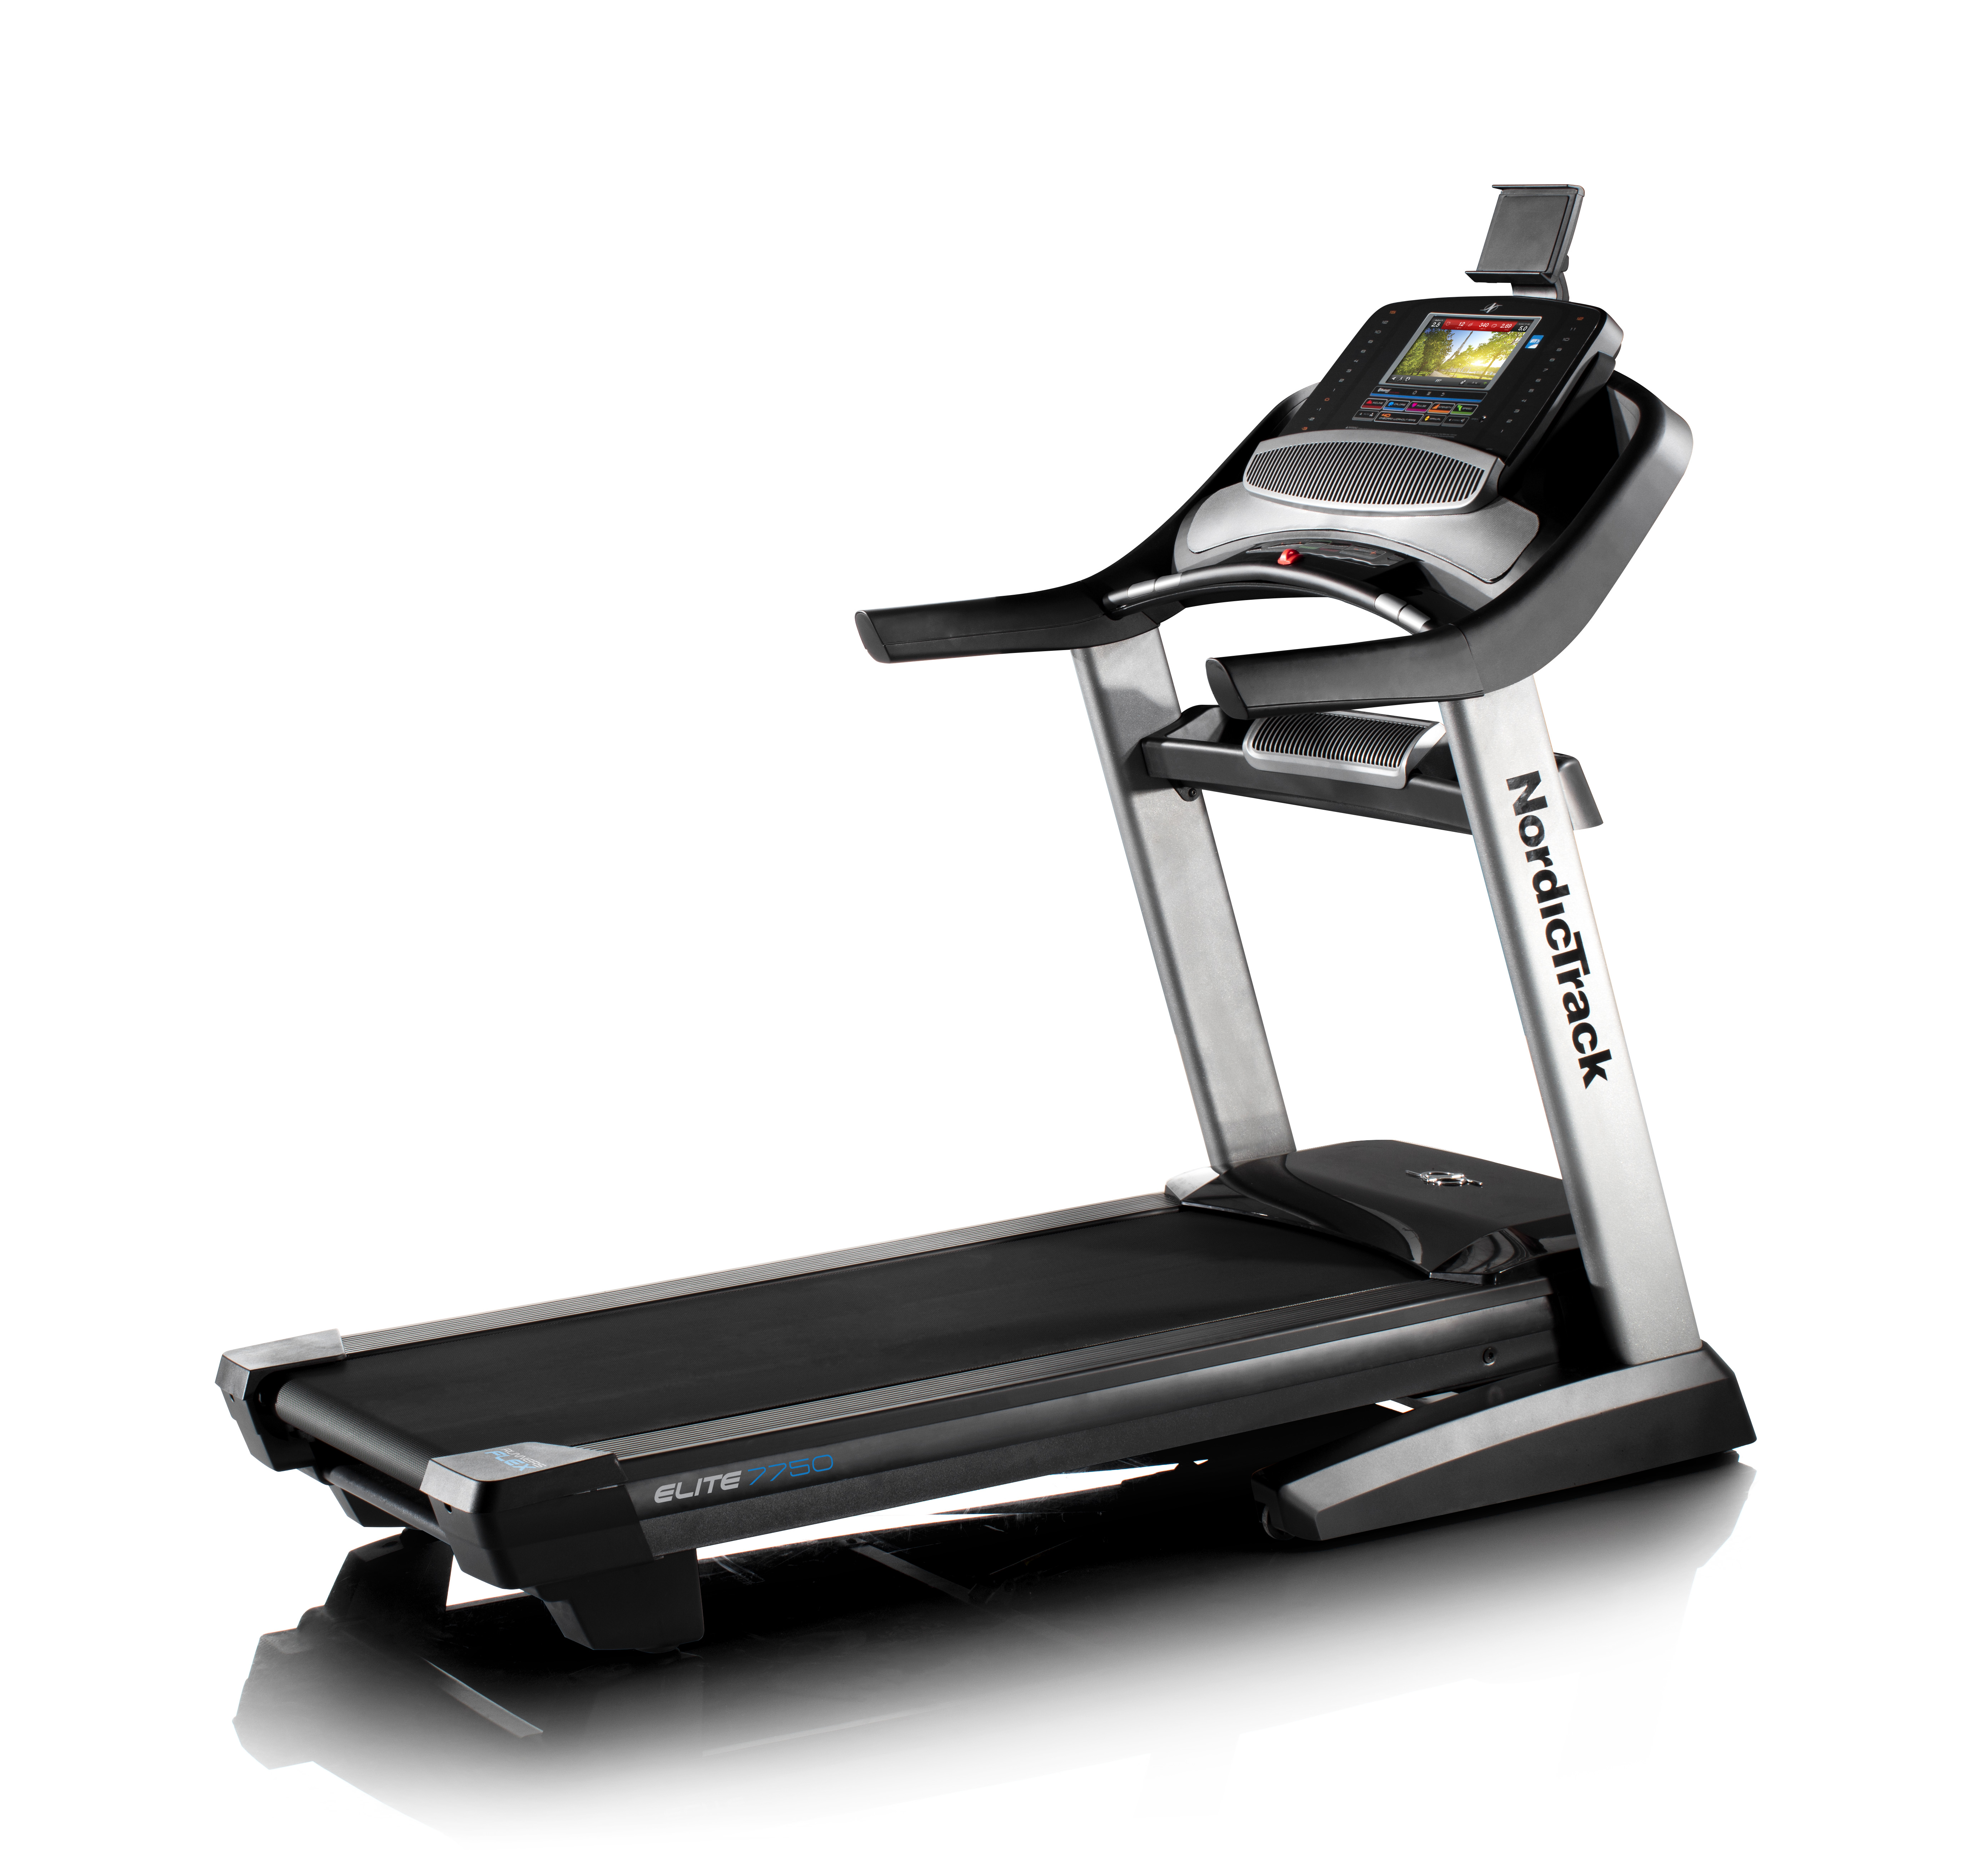 Shld Quote: NordicTrack Elite 7750 Treadmill